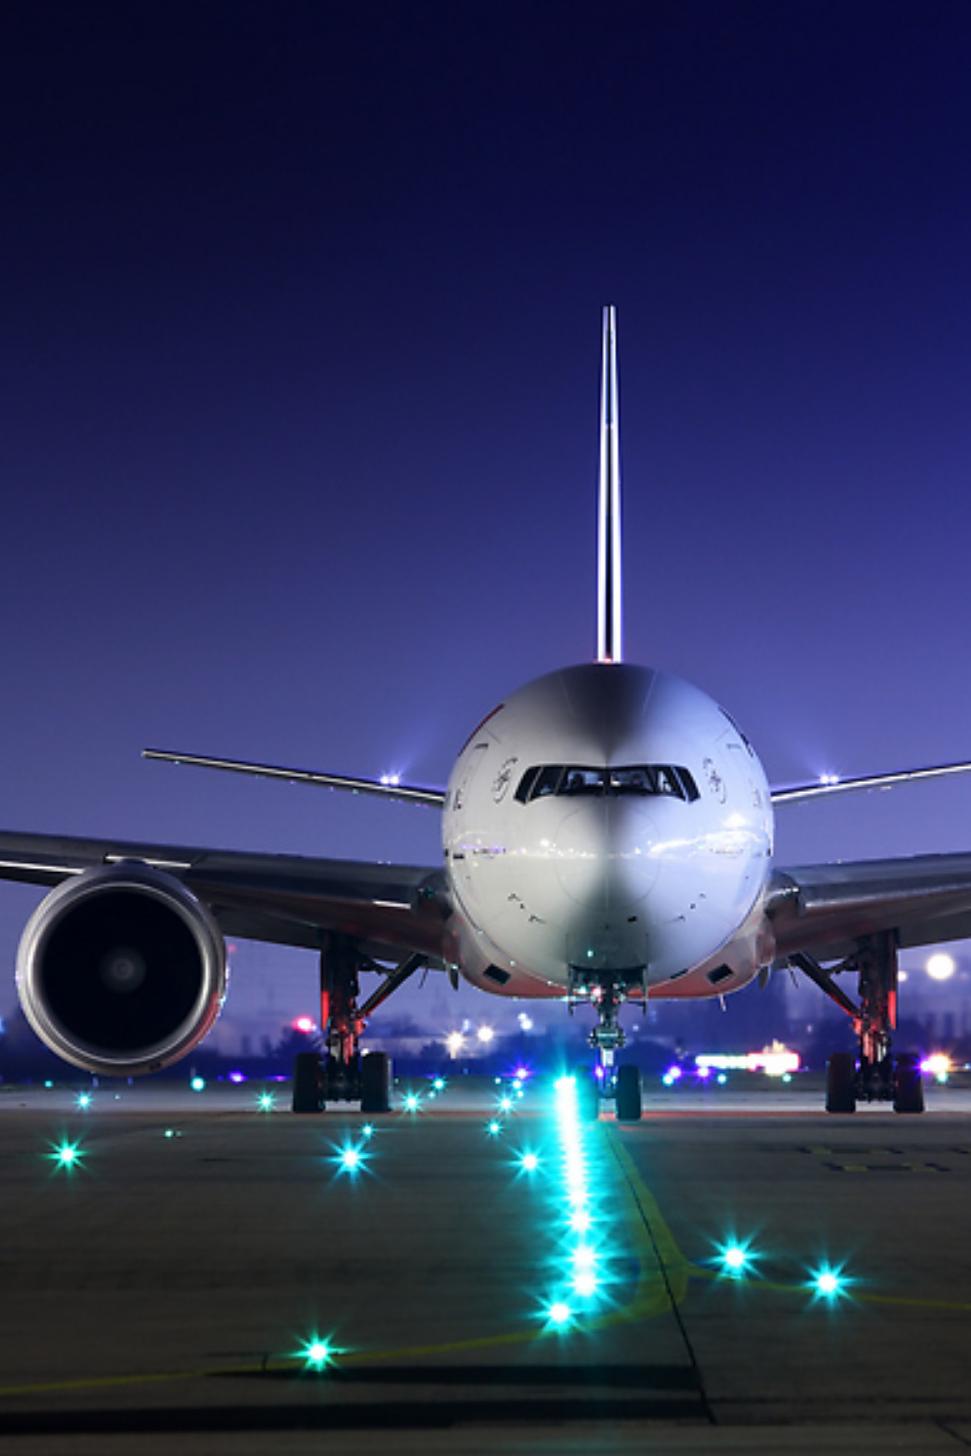 Air France Boeing 777 328 Er Aviation Airplane Boeing 777 Air France